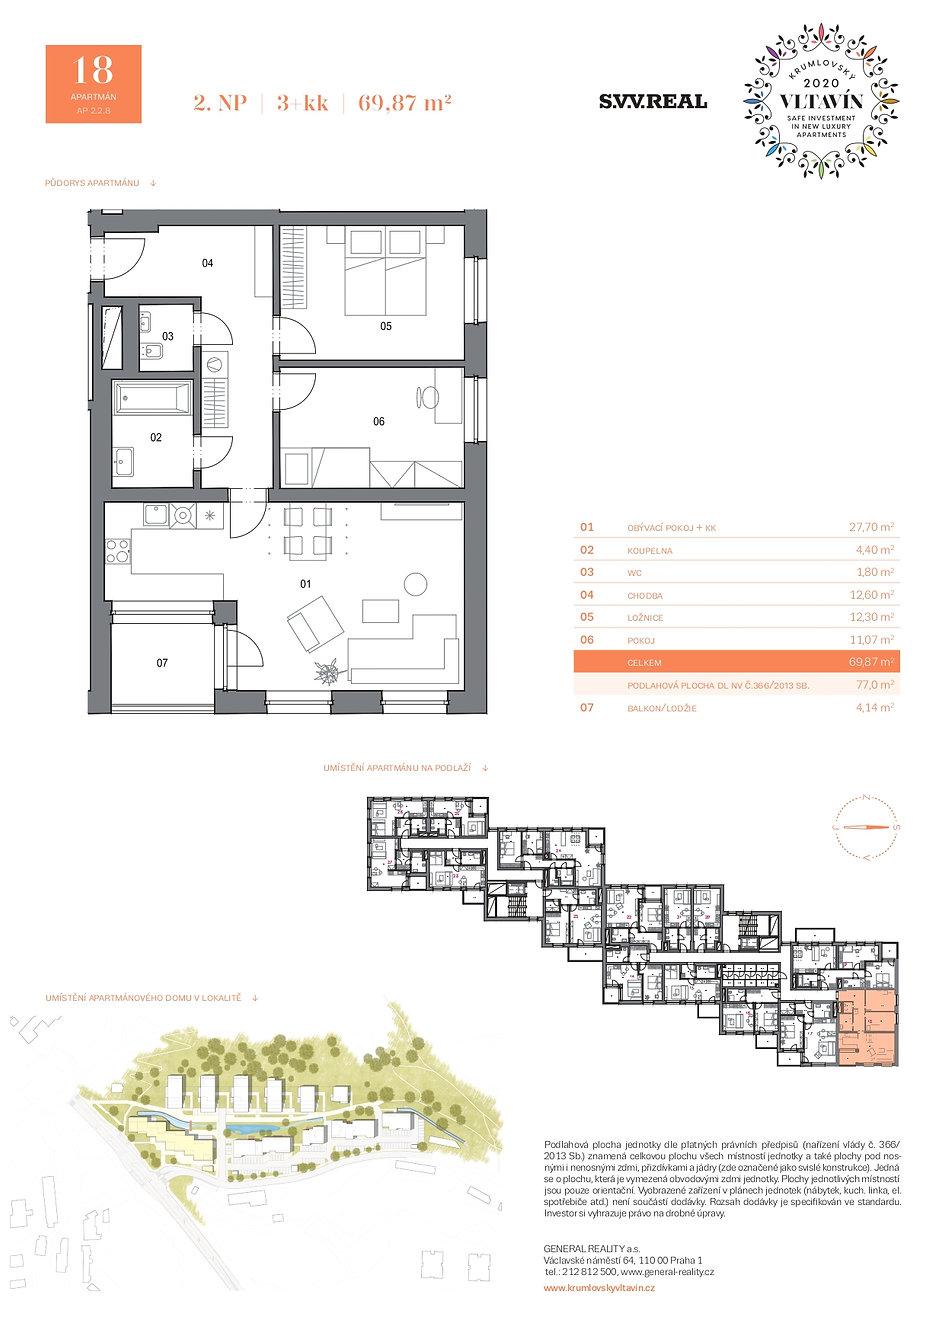 GR_krumlovsky-vltavin_bytove-karty-apartmany_2NP_A18_page-0001.jpg